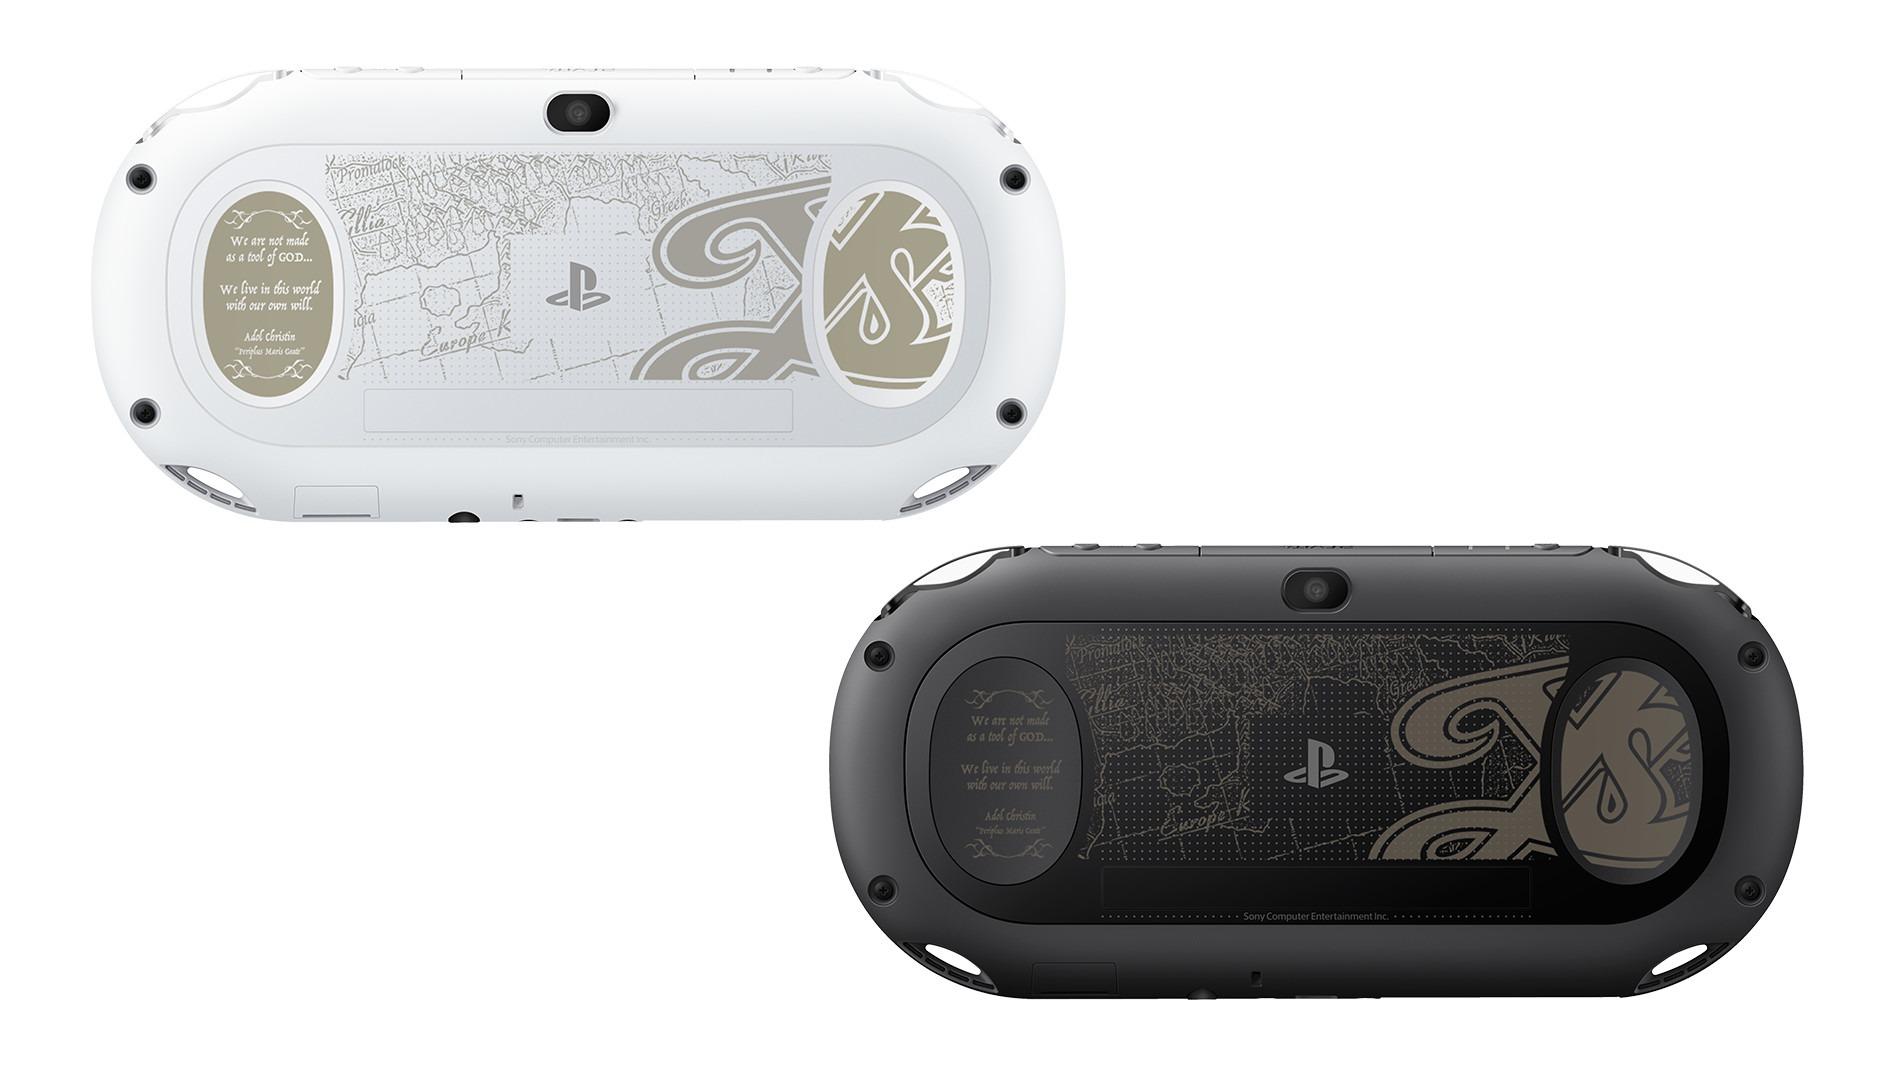 Ys VIII PS Vita Models